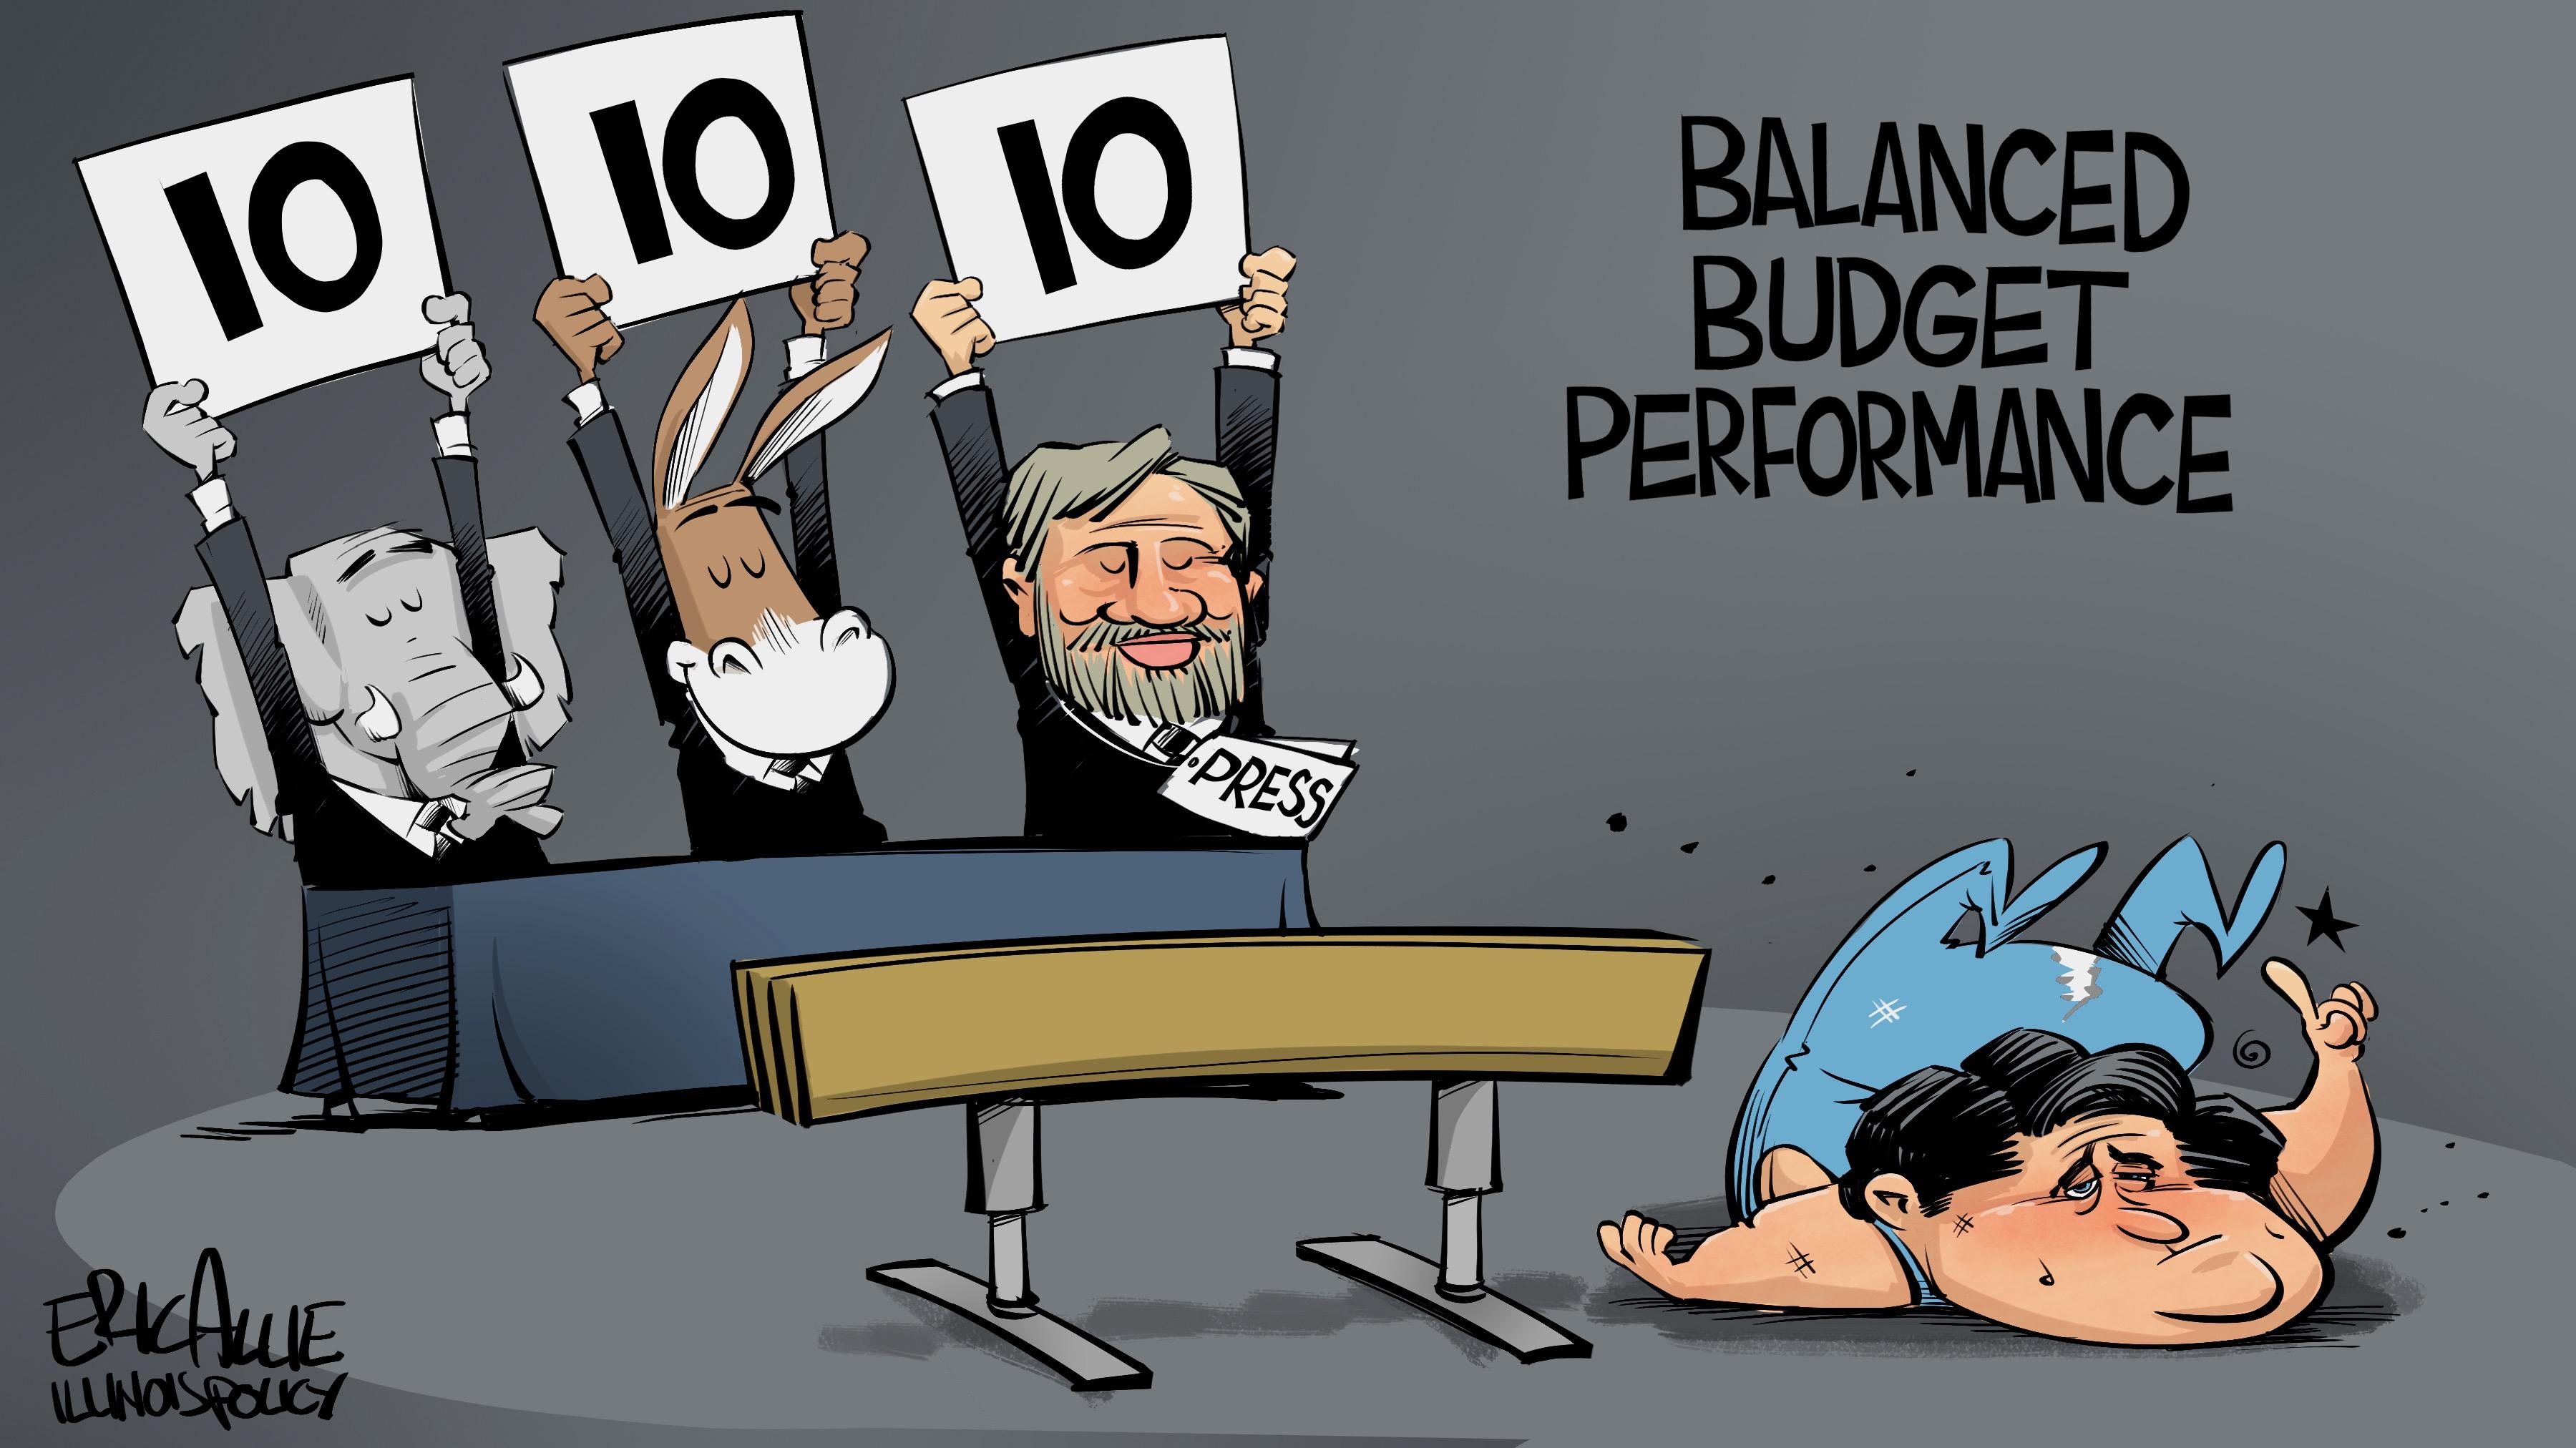 Balanced budget performance